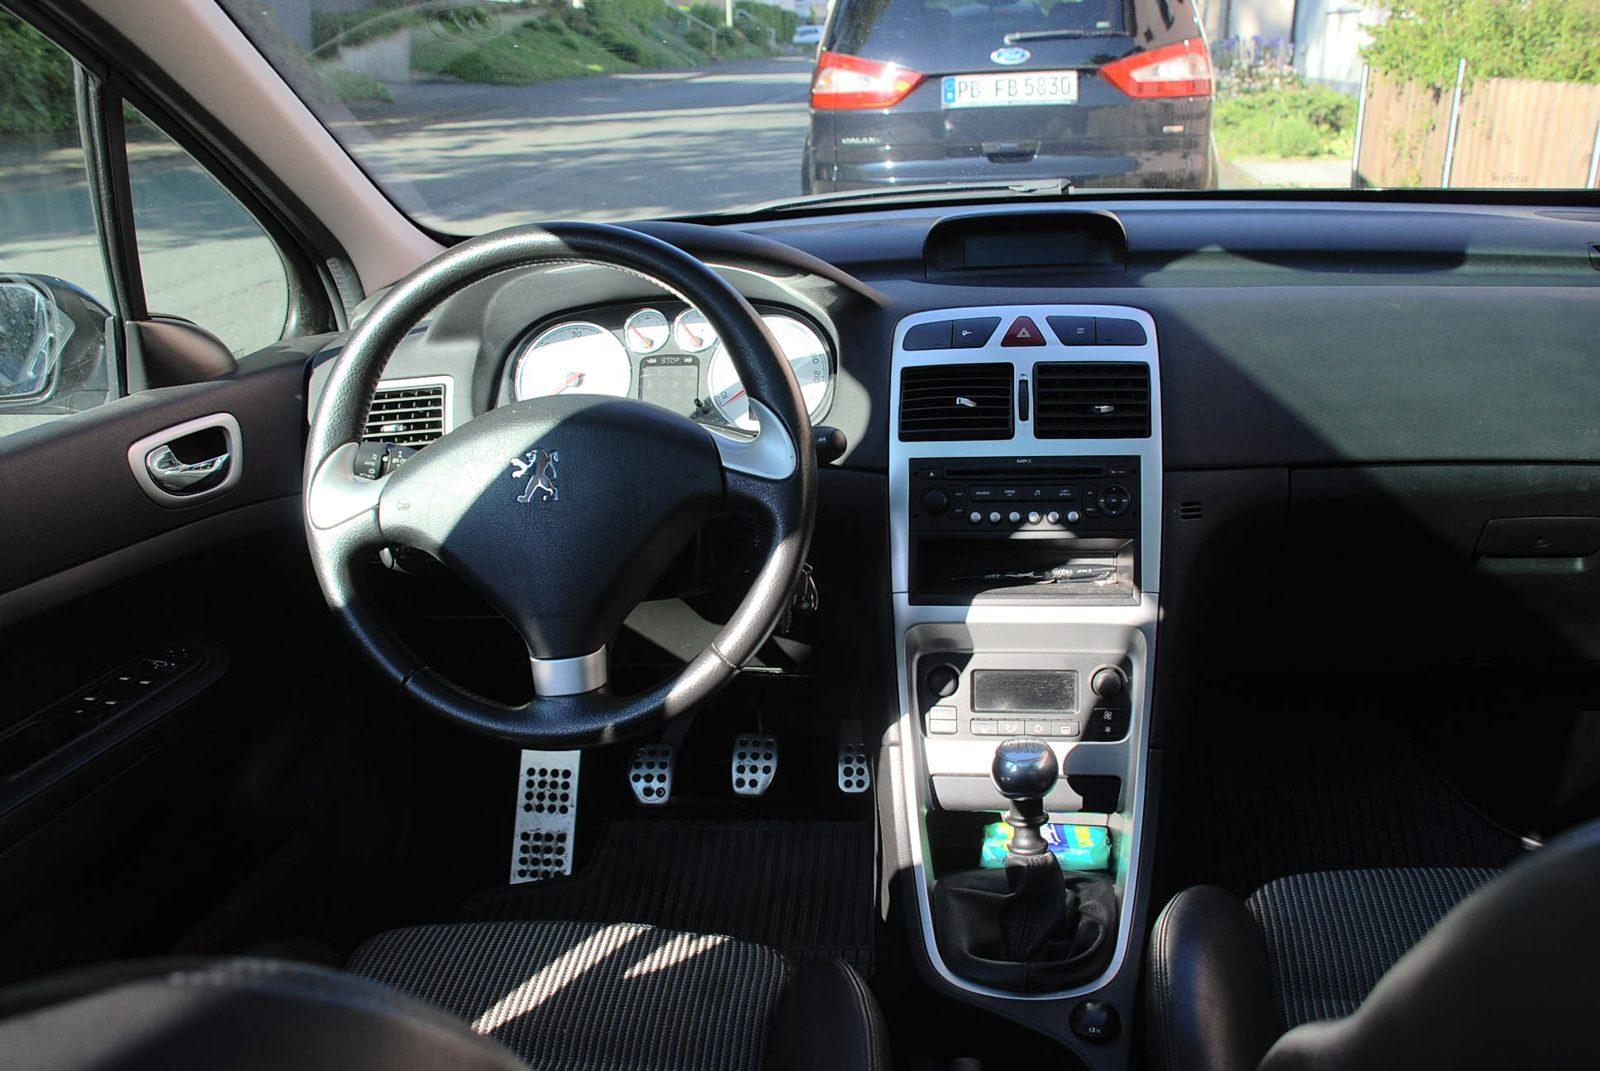 2012 Peugeot 307l